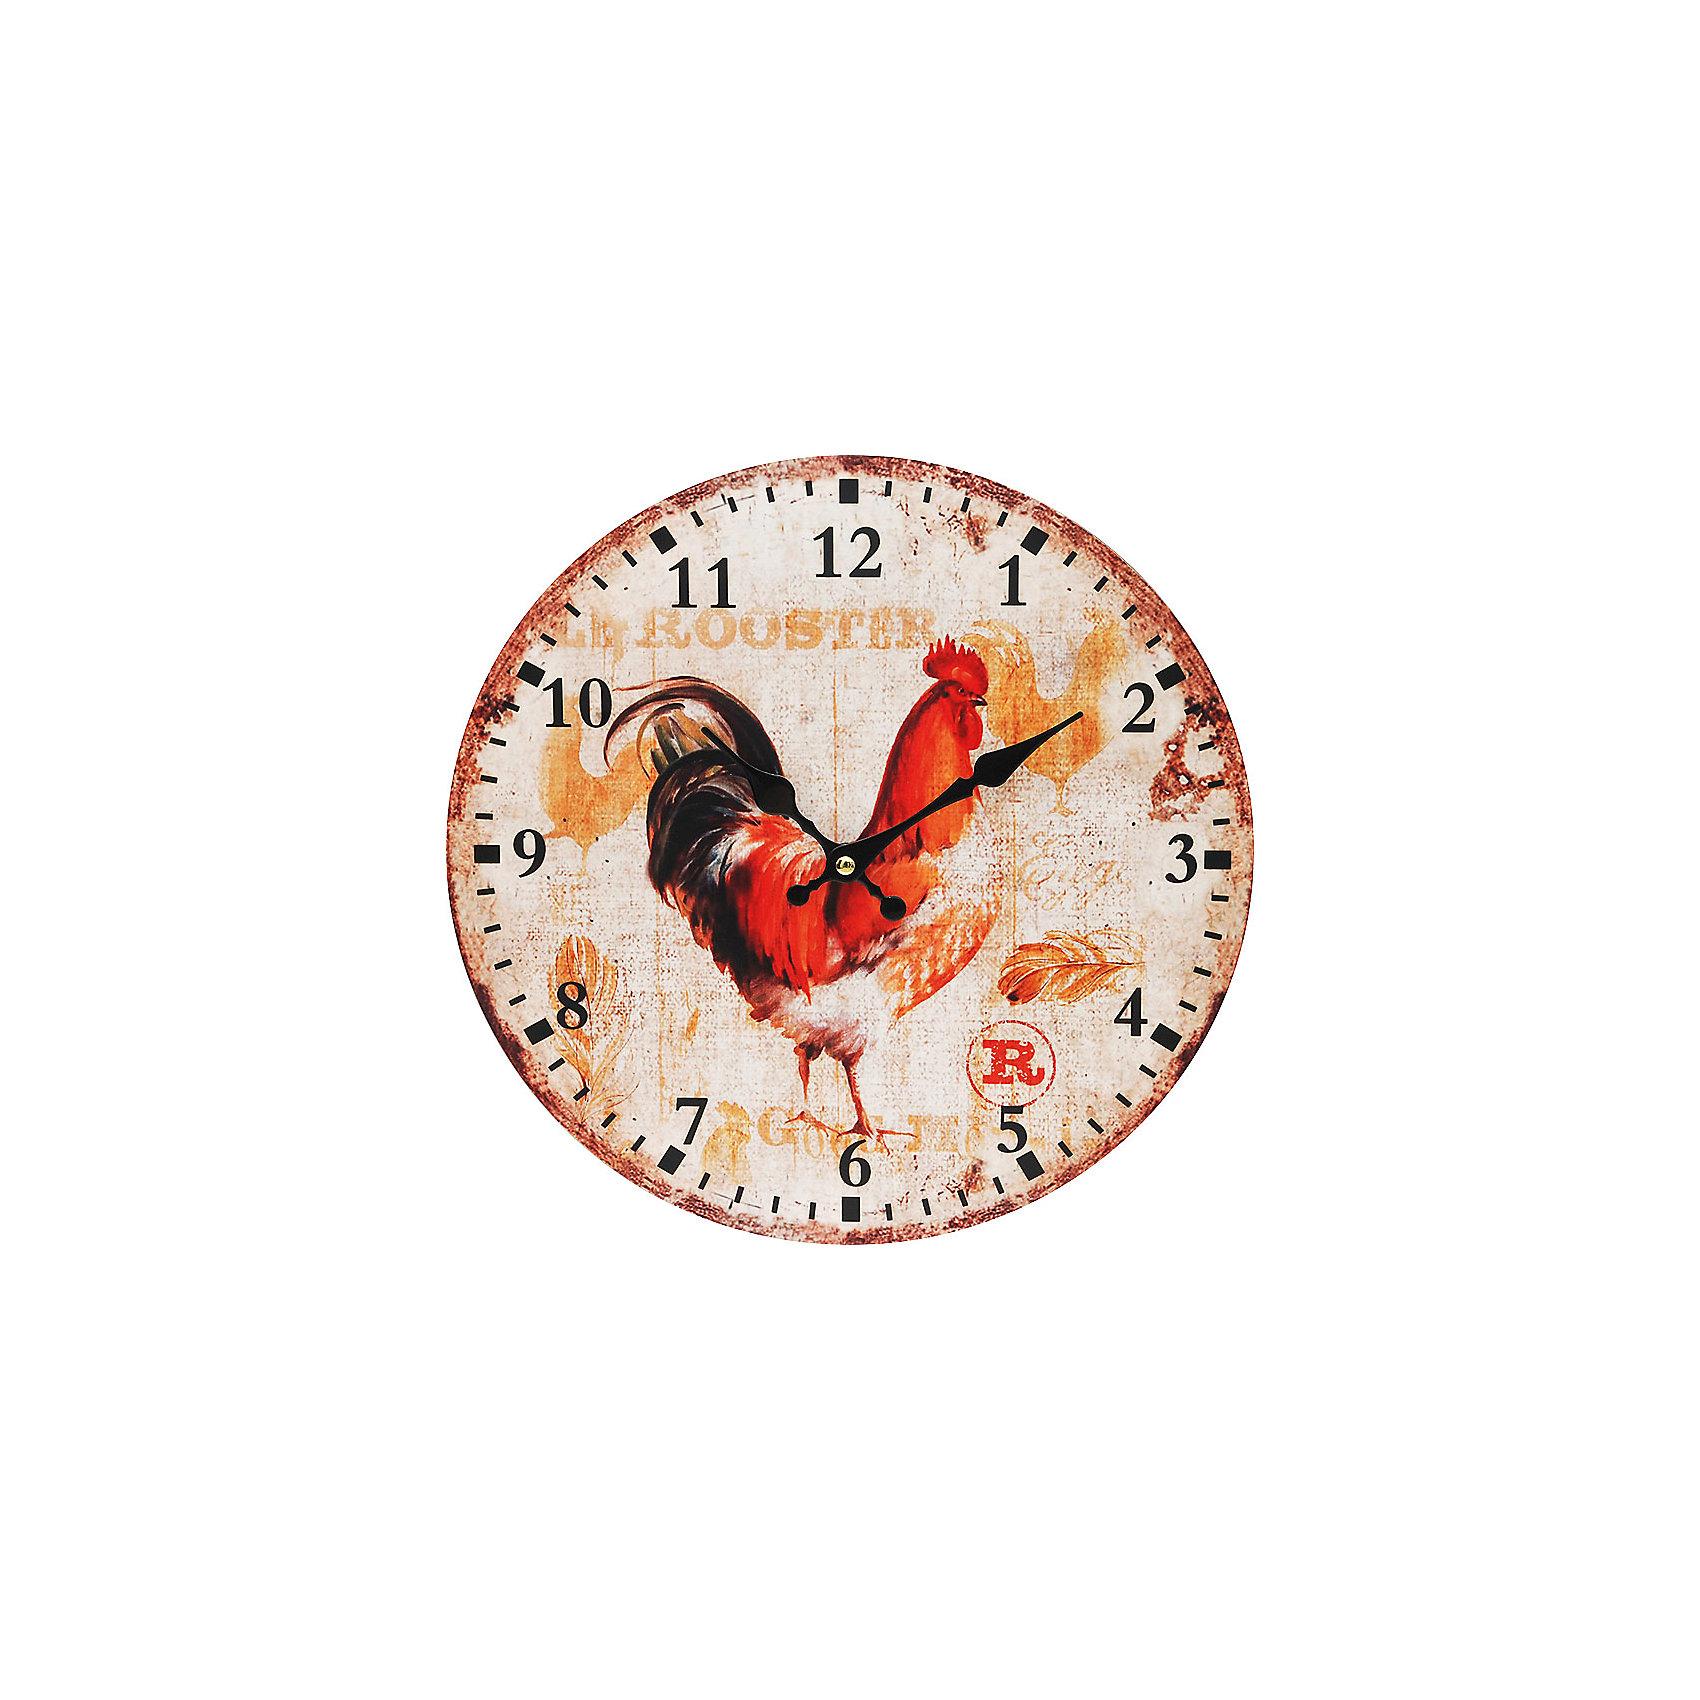 Часы настенные Петушок, диаметр 34 смВсё для праздника<br>Часы<br><br>Ширина мм: 345<br>Глубина мм: 340<br>Высота мм: 45<br>Вес г: 2500<br>Возраст от месяцев: 72<br>Возраст до месяцев: 144<br>Пол: Унисекс<br>Возраст: Детский<br>SKU: 5089817